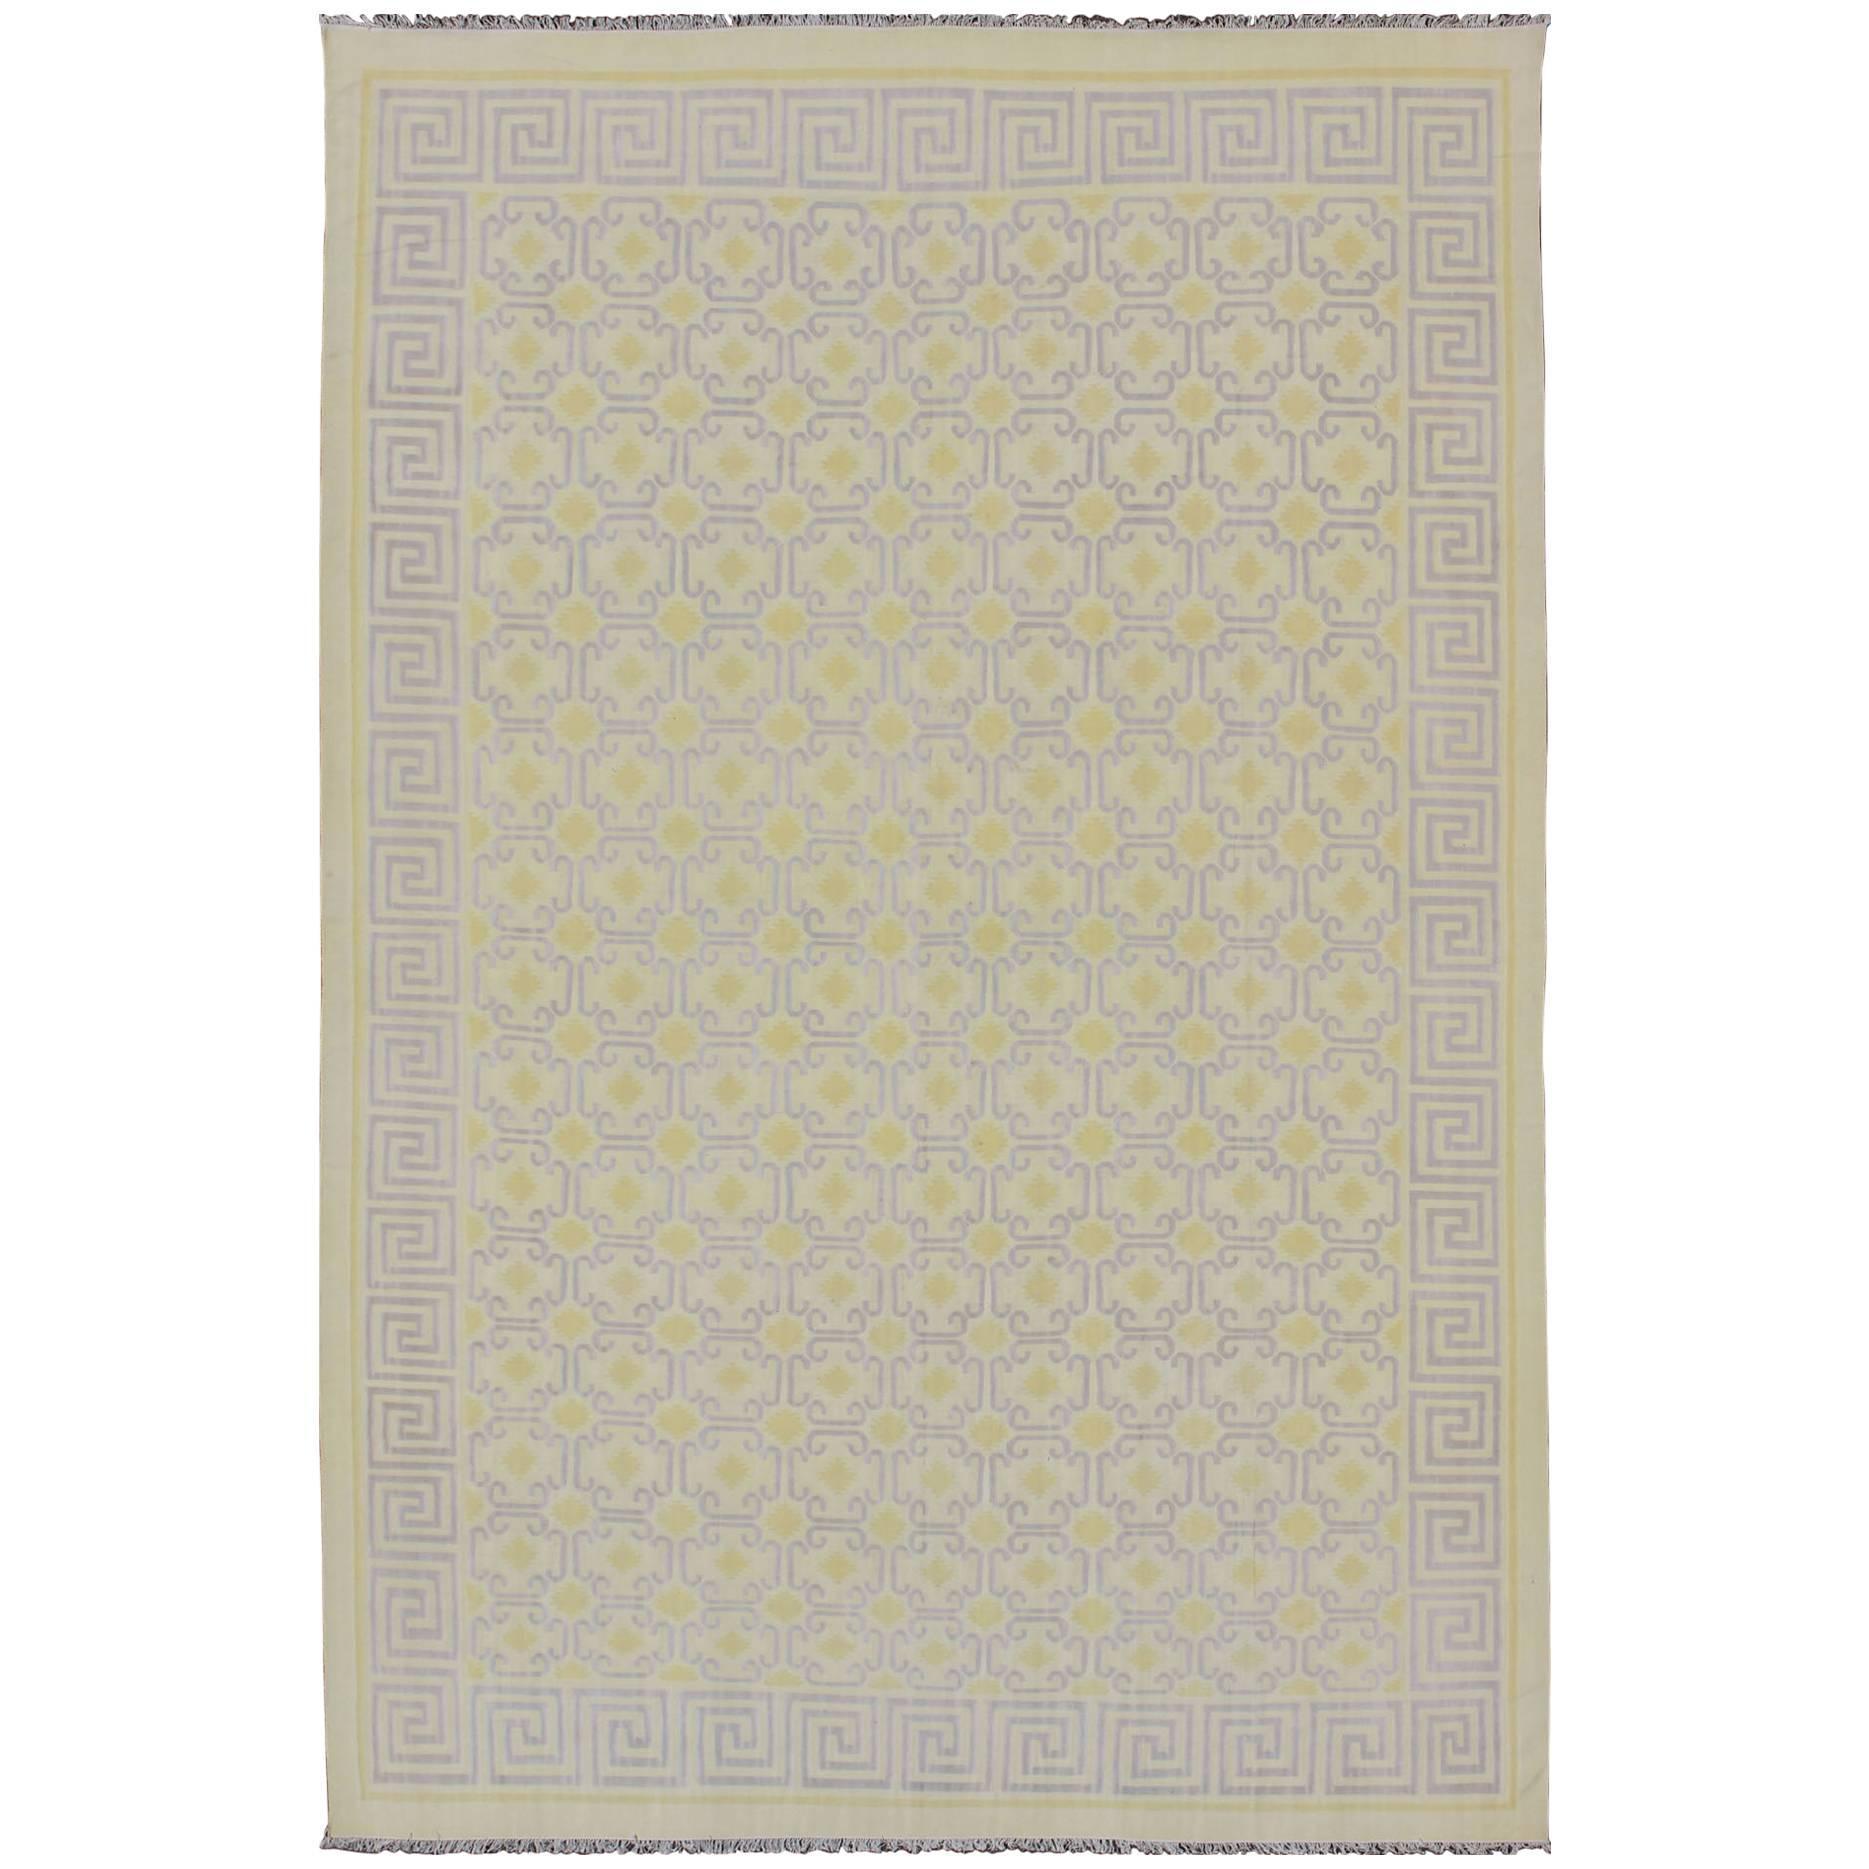 Large Vintage Indian Cotton Dhurrie